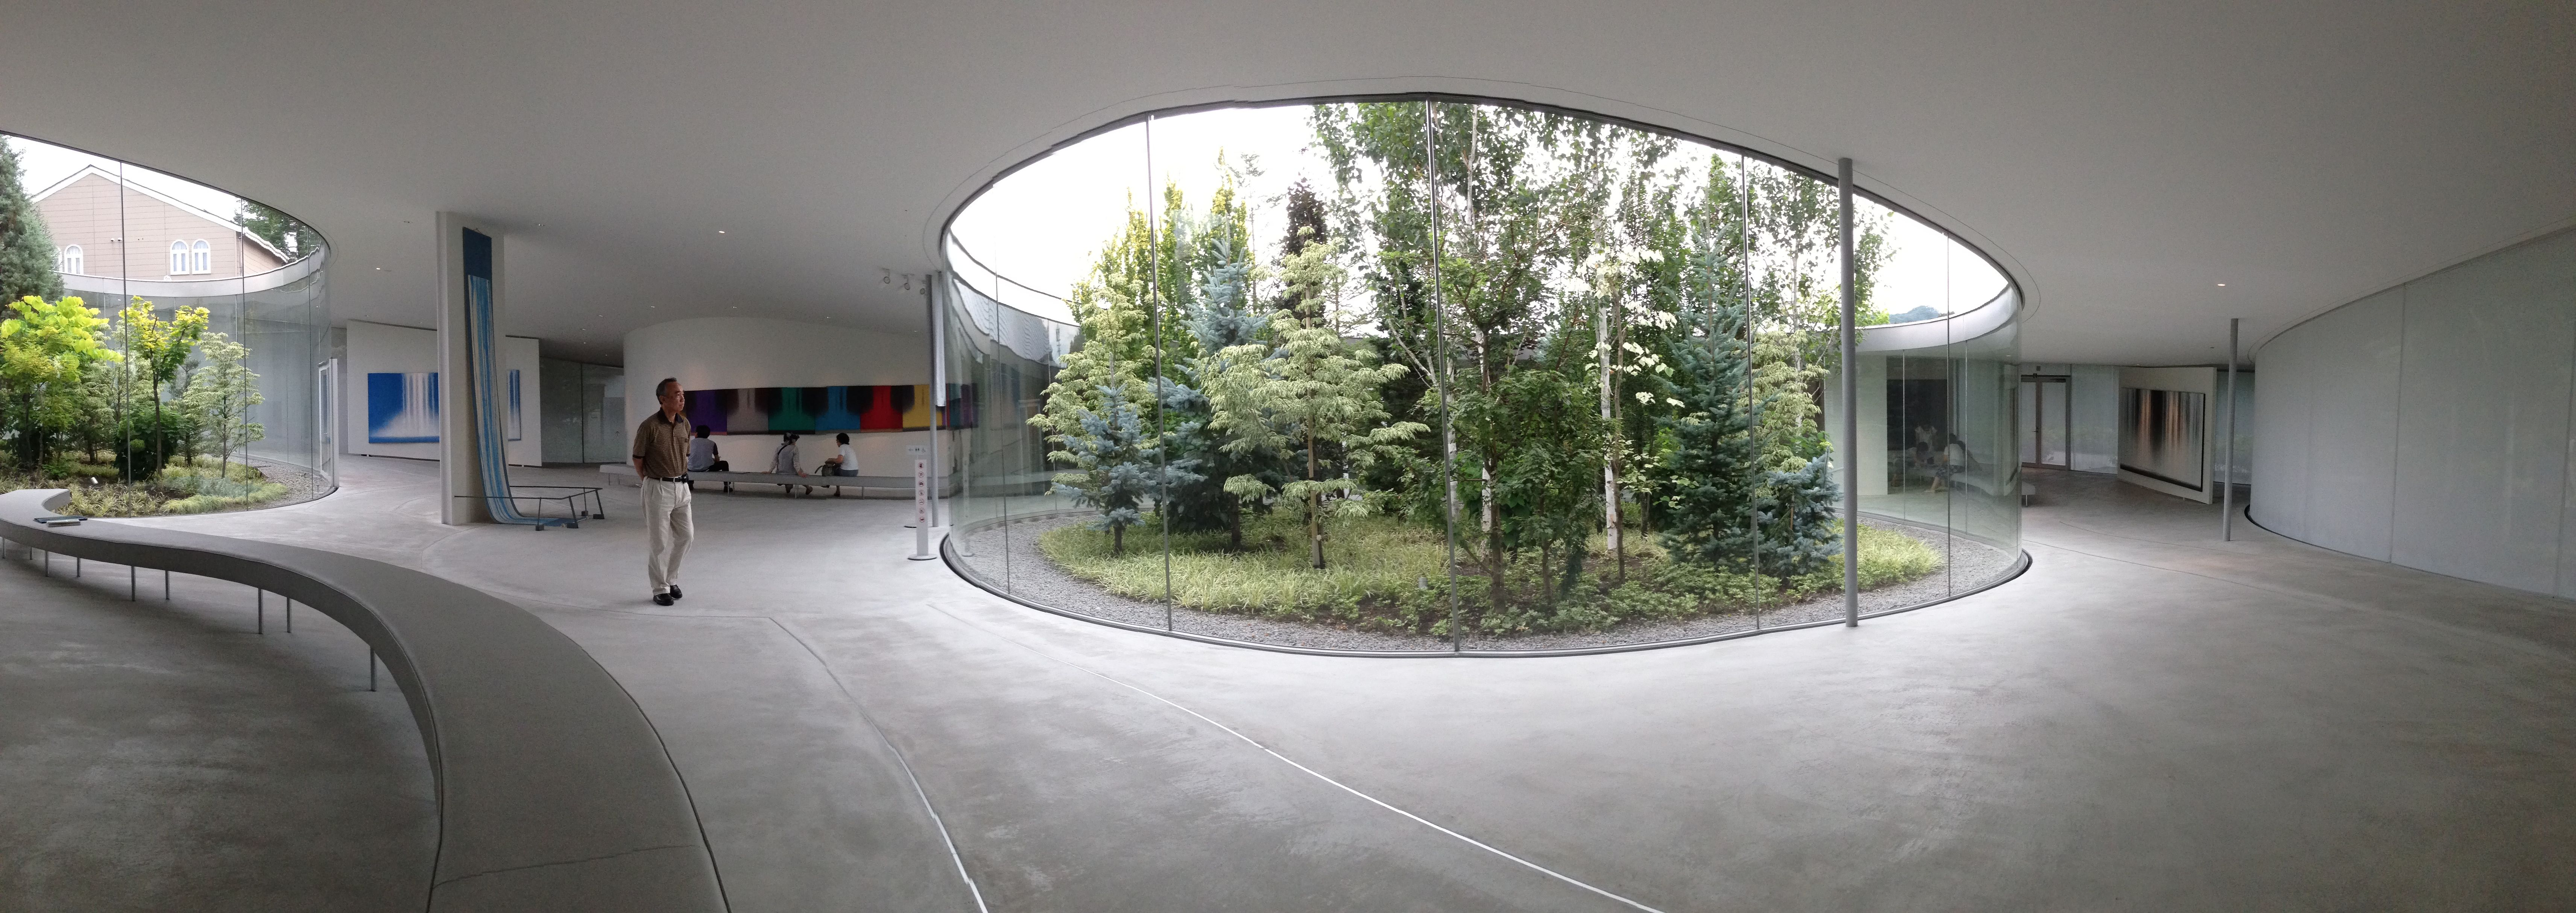 Senju hiroshi museum karuizawa architect sanaa for Karuizawa architecture